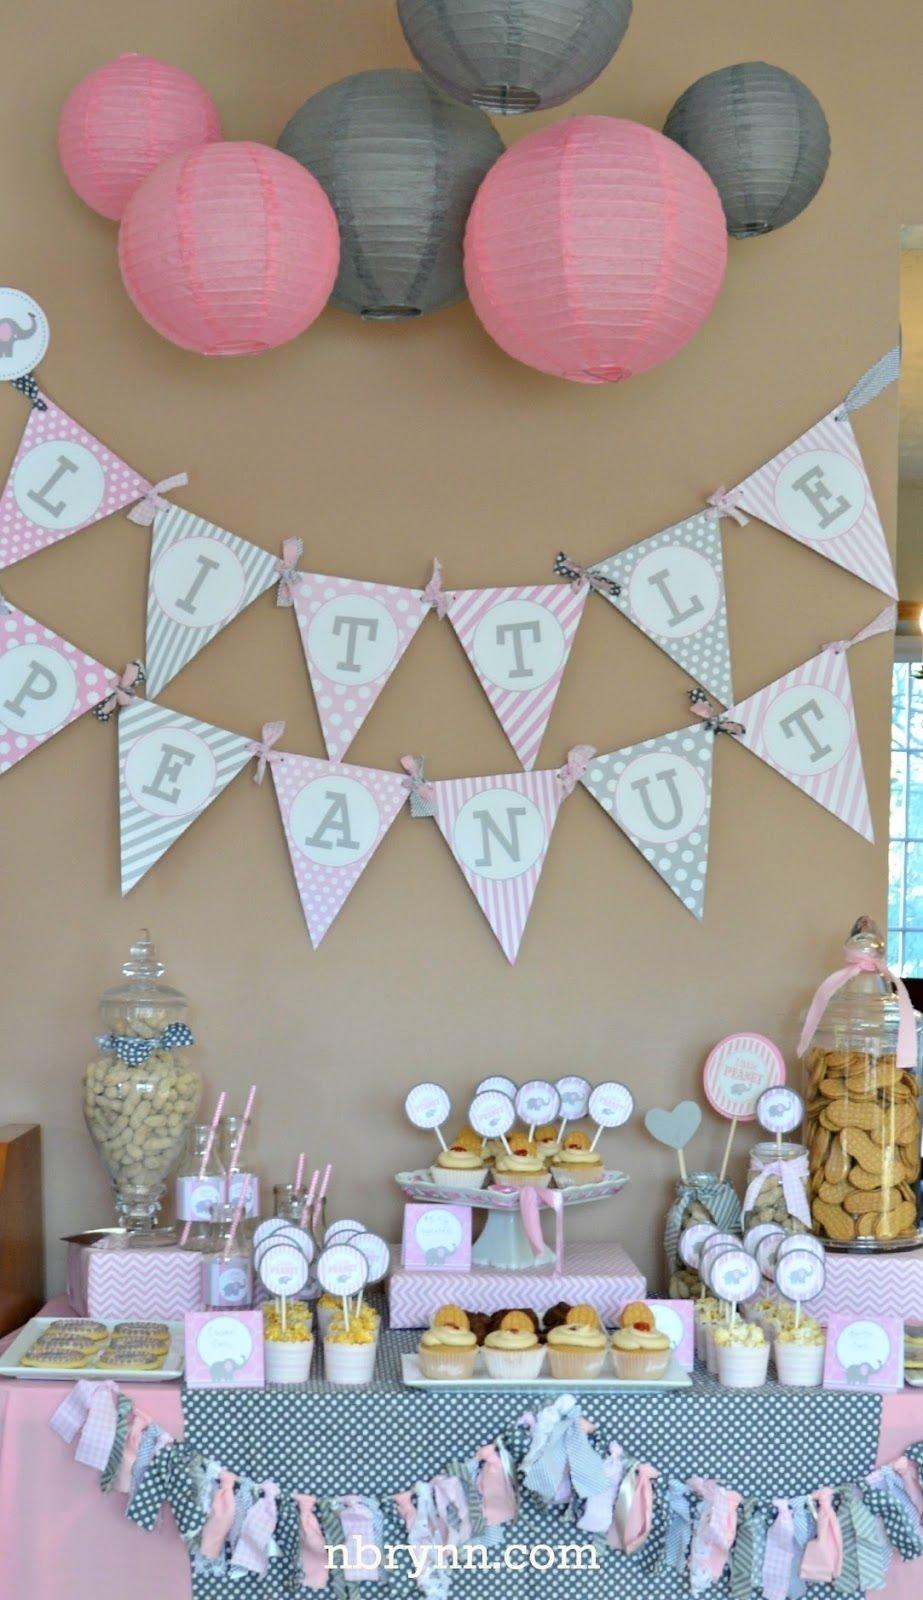 10 Pretty Ideas For A Baby Shower nbrynn little peanut baby shower party ideas pinterest peanut 2020